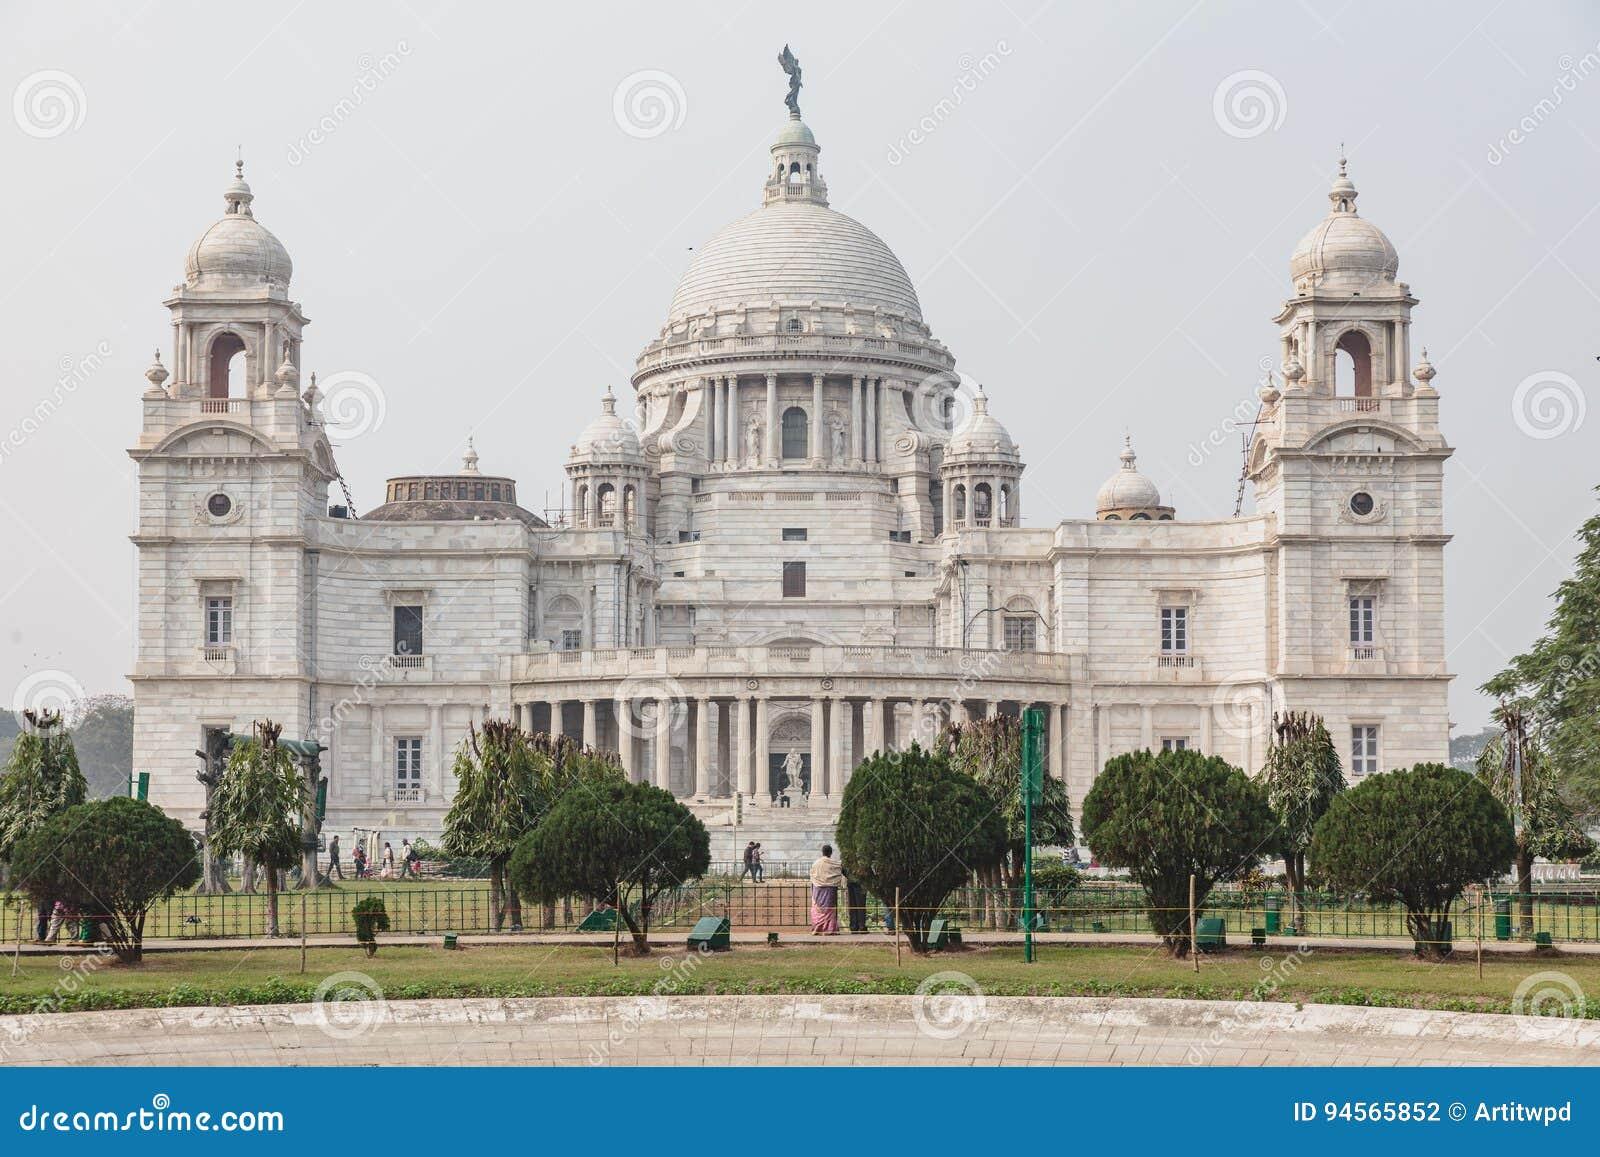 Left side of VIctoria Memorial Hall in Kolkata, India.